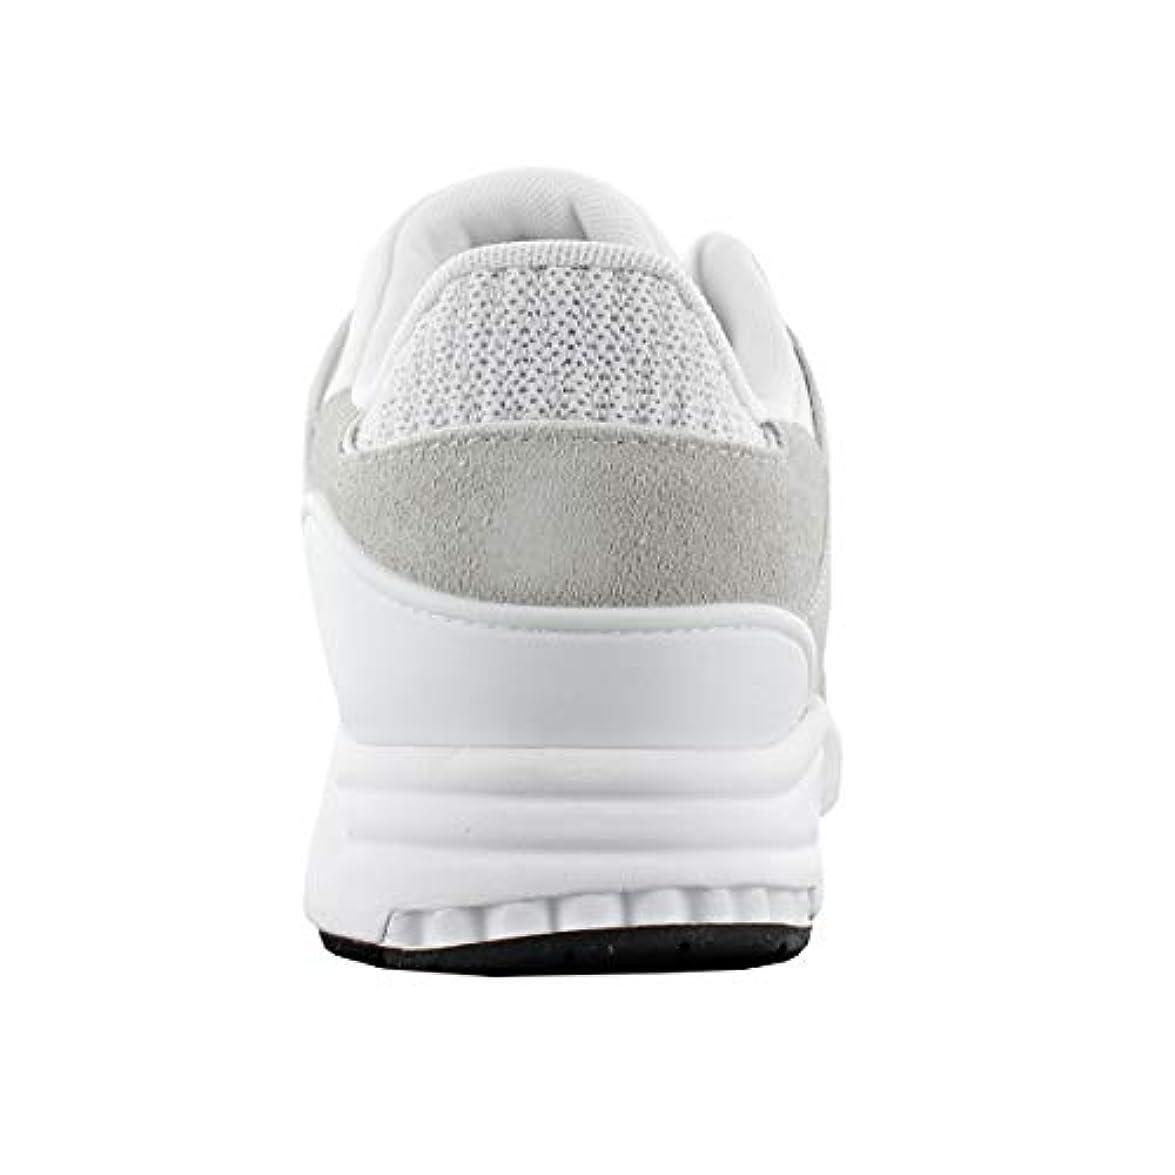 Adidas Eqt Support Rf Scarpe Da Fitness Uomo